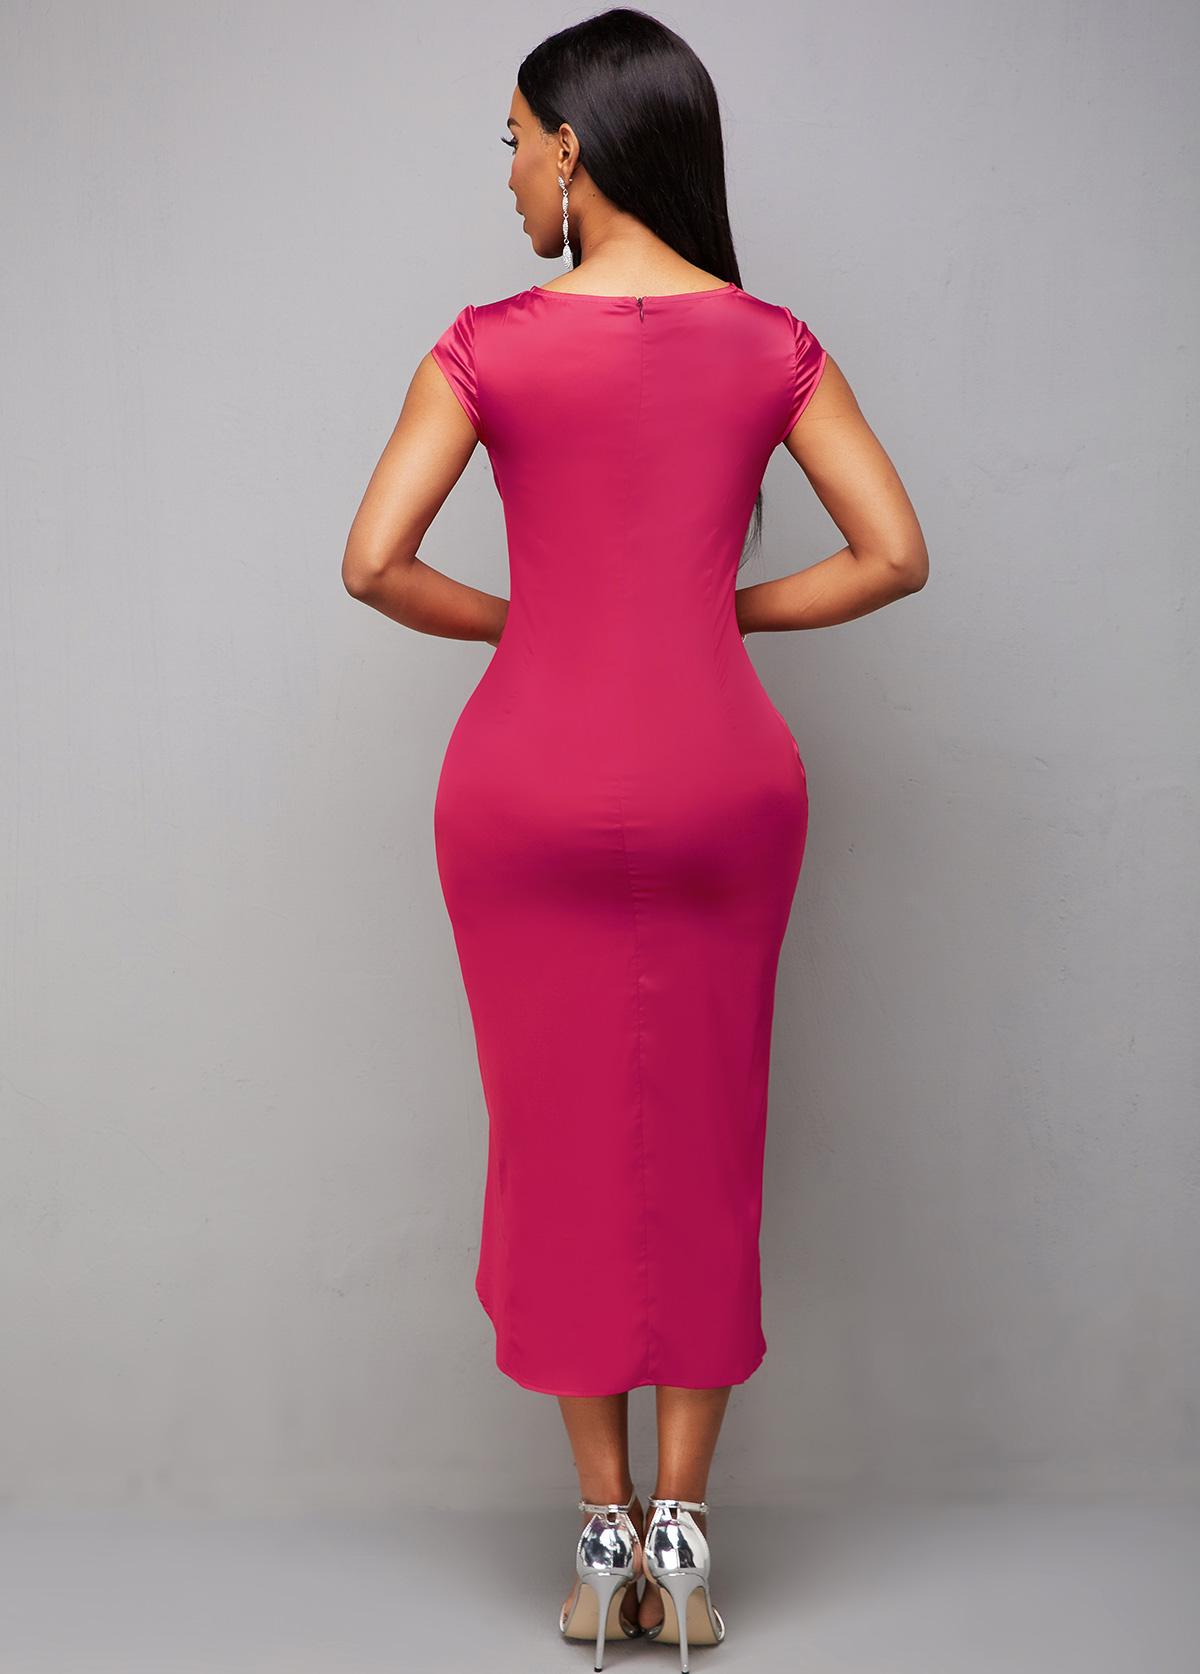 Ruched Asymmetric Hem Cap Sleeve Bodycon Dress